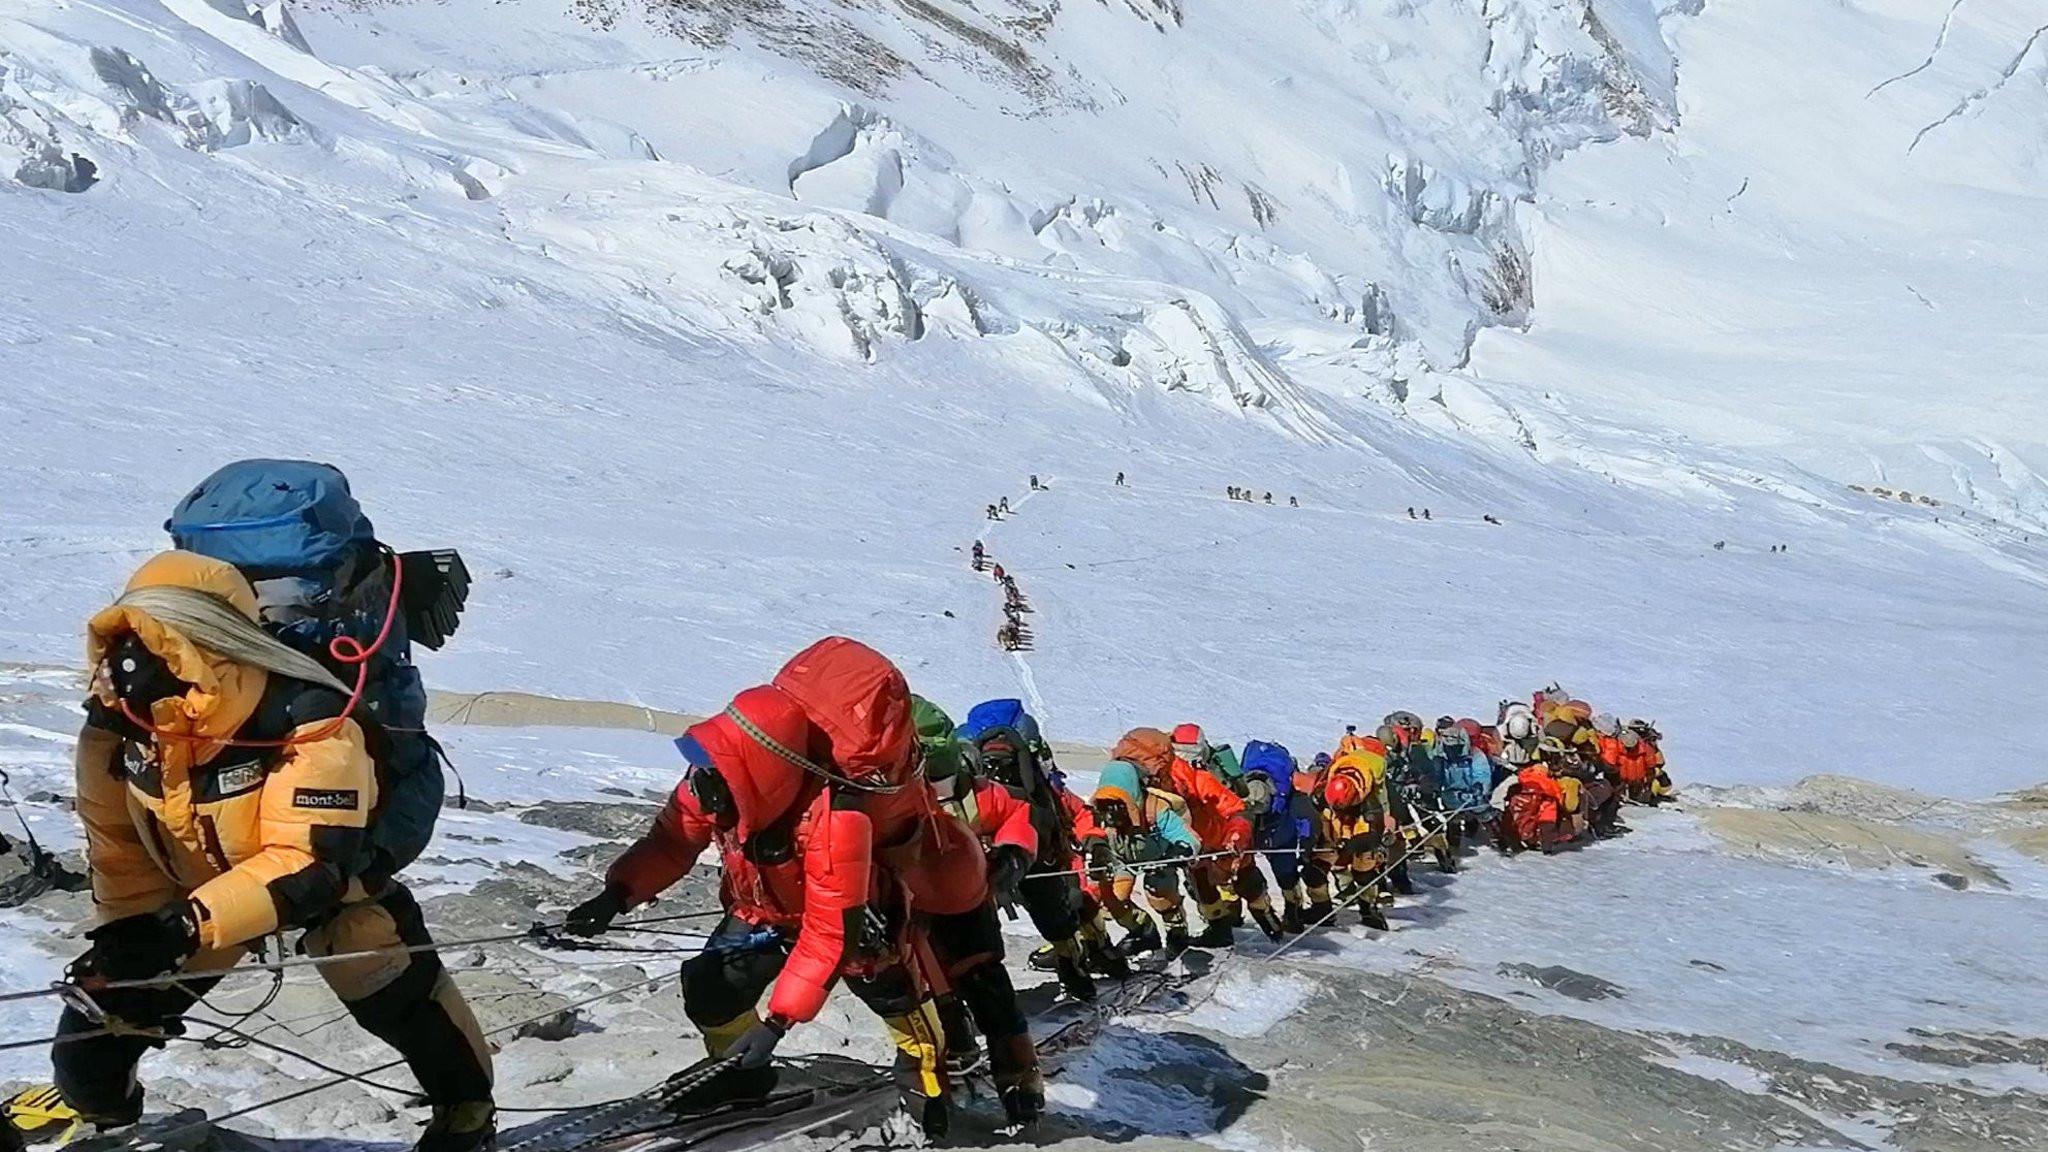 Coronavirus reaches Mount Everest as climber tests positive